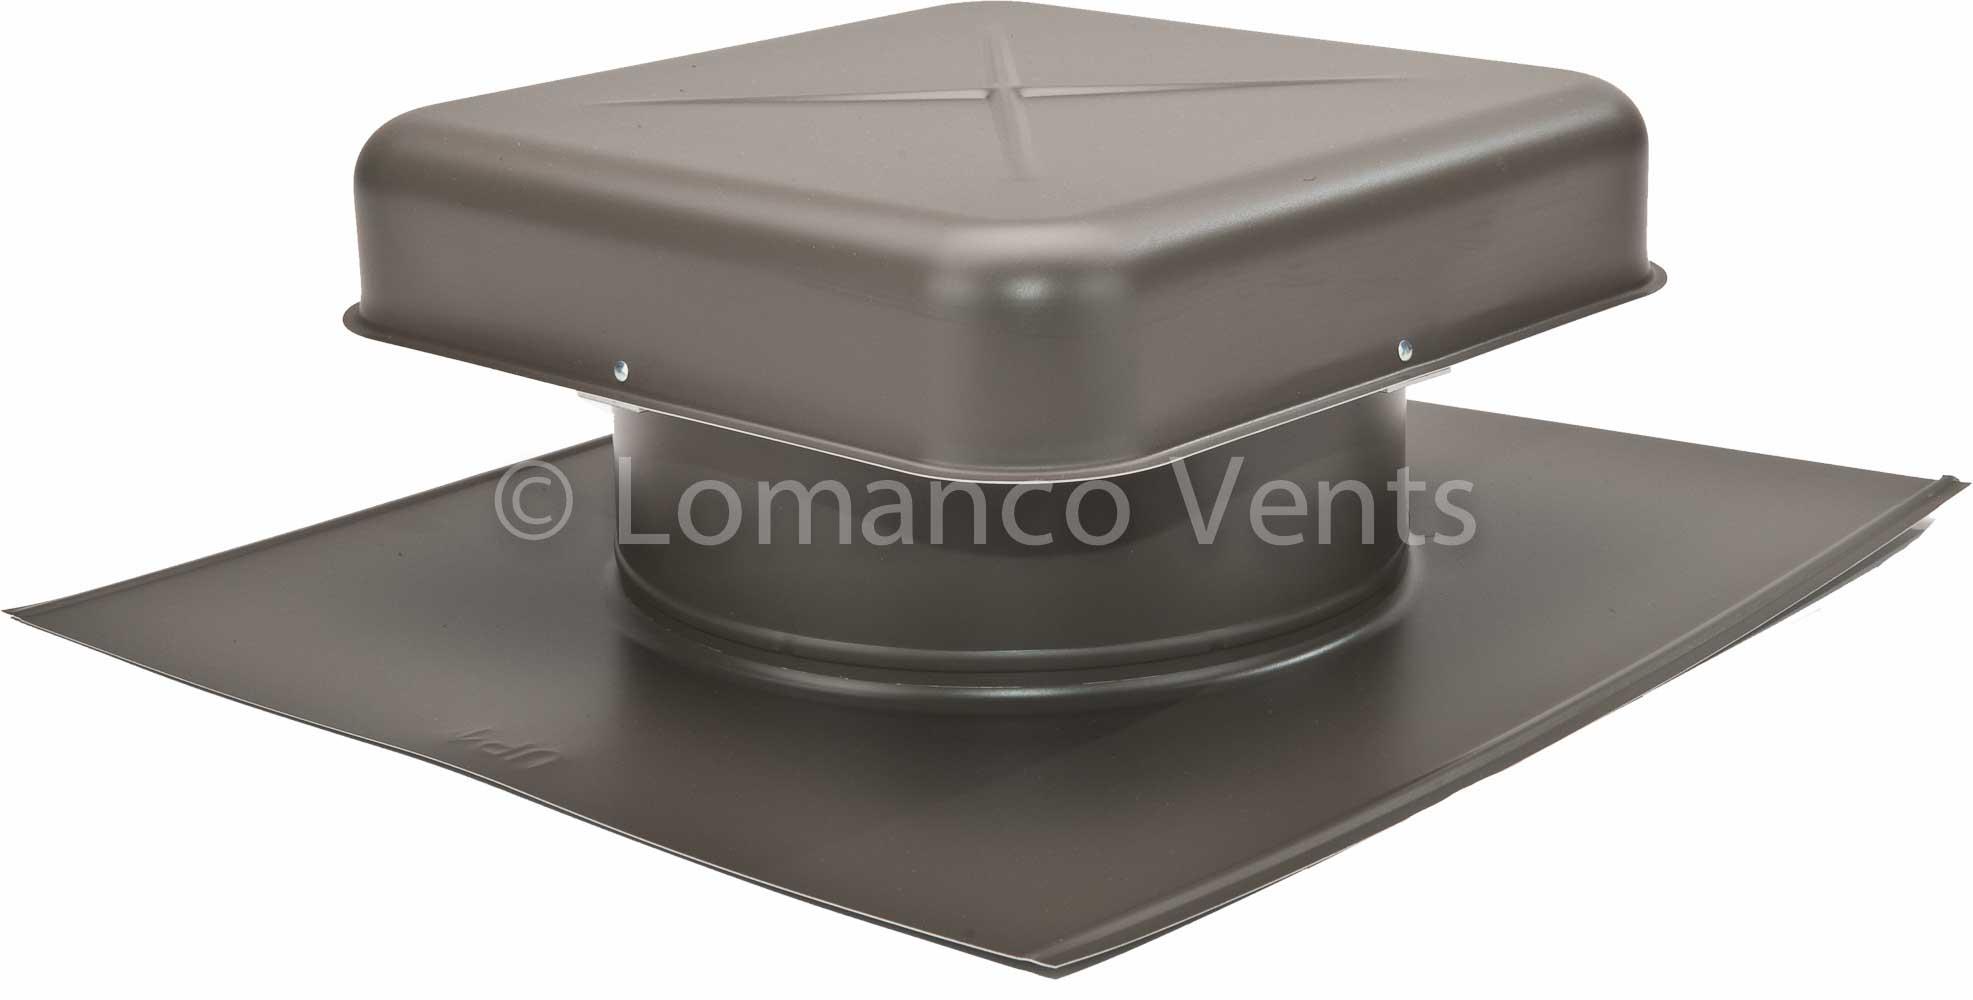 Lomanco Vents   Static Roof Vents